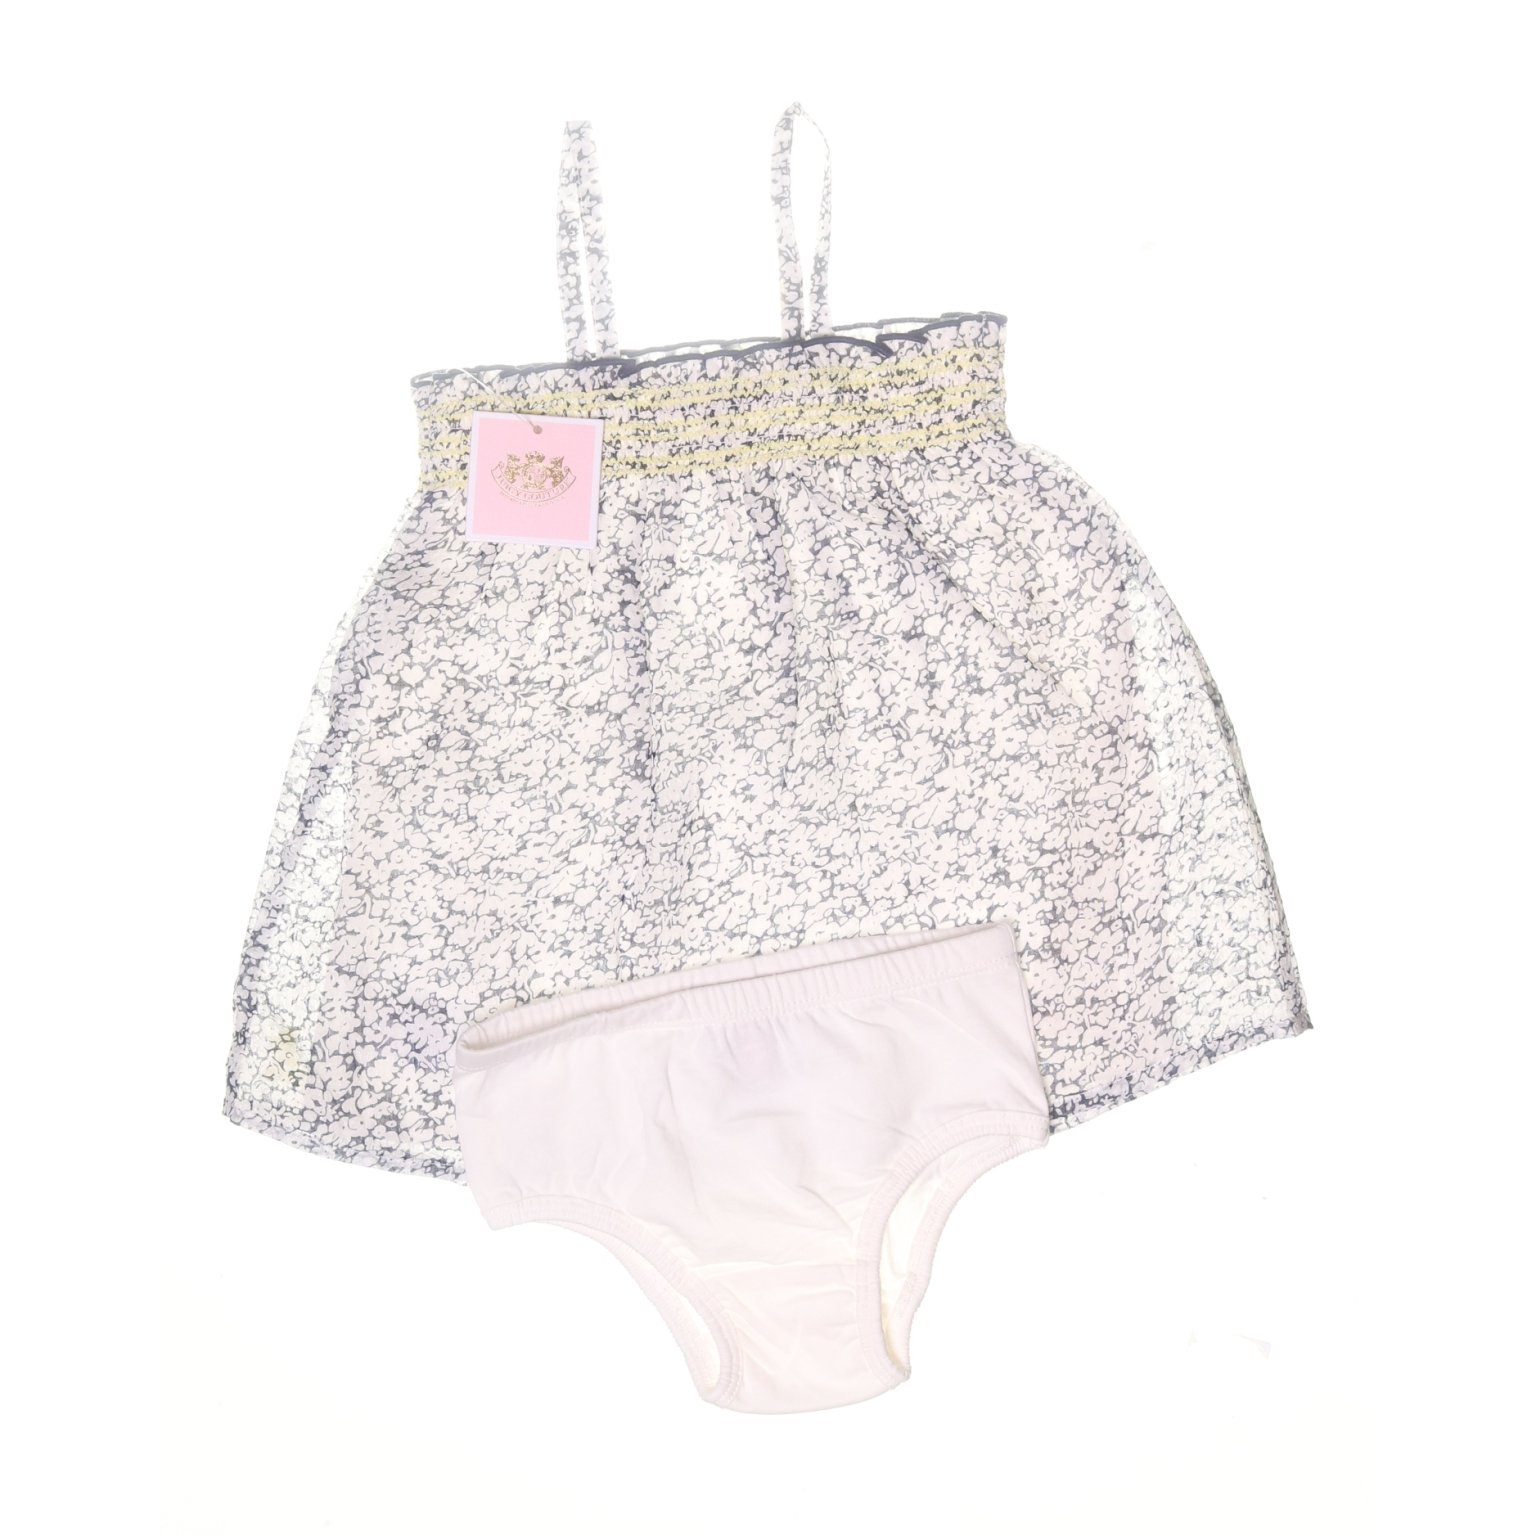 Juicy Couture, Klänning, Strl: 92, Girls 2 PC Dress Set, VitBlå, Polyester